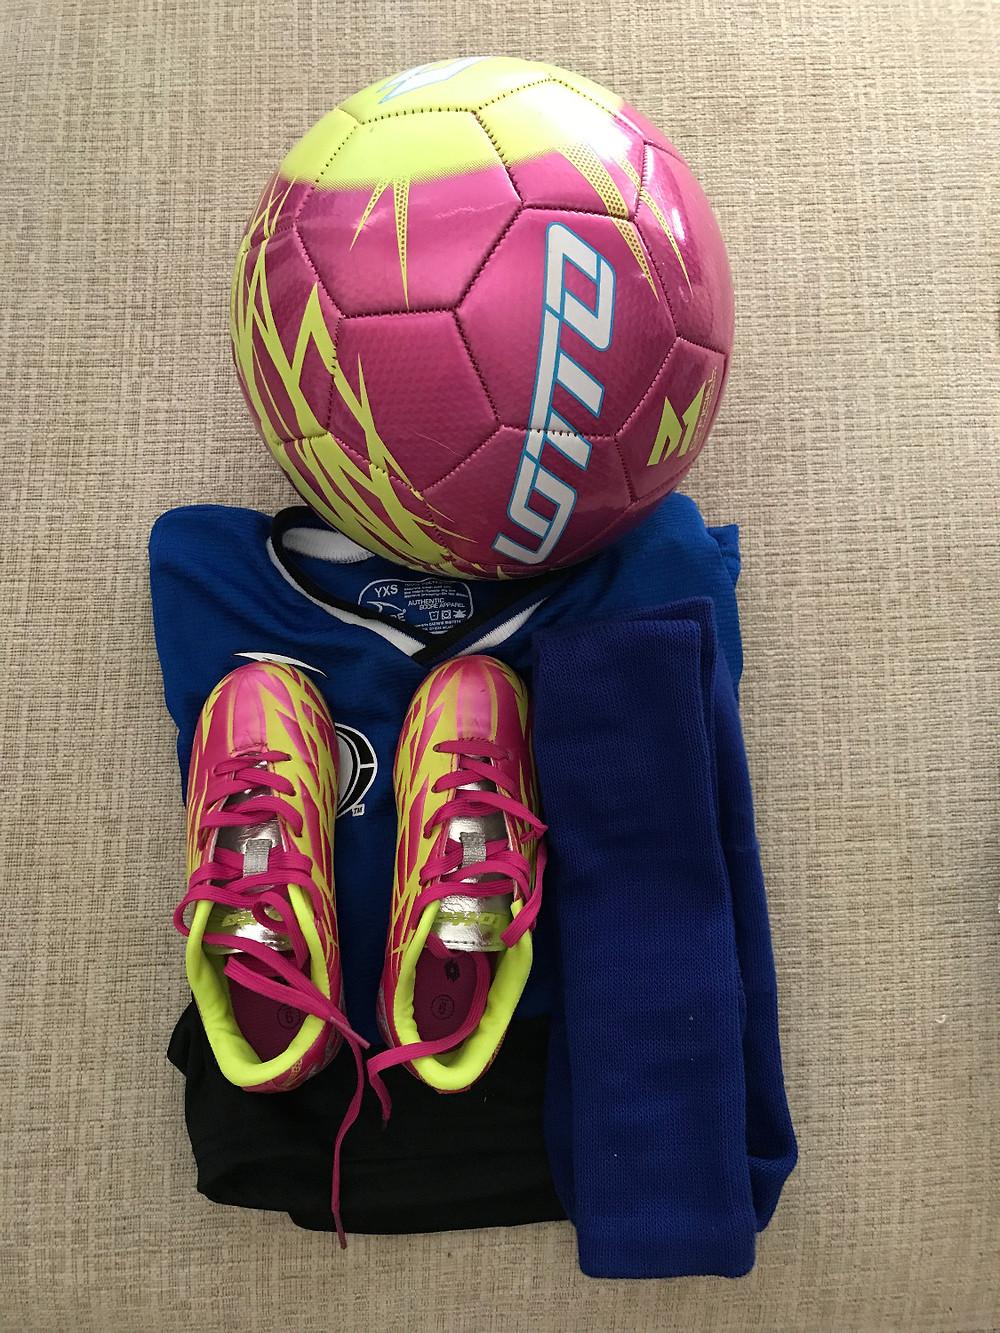 Soccer Equipment Stylish Organization